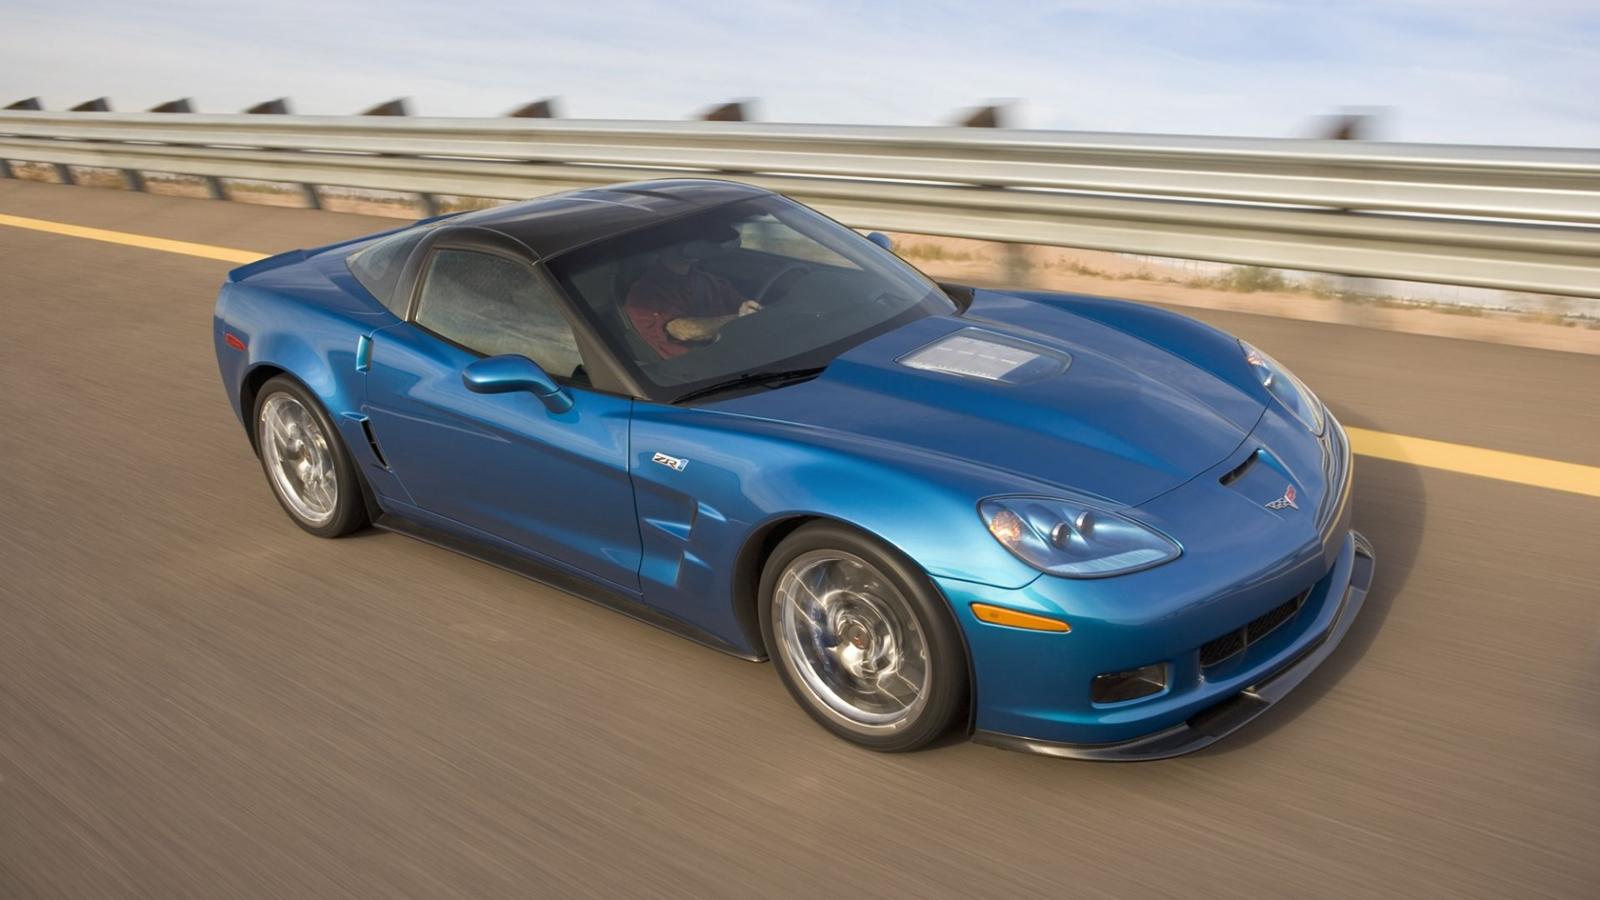 Chevrolet Corvette azul - 1600x900